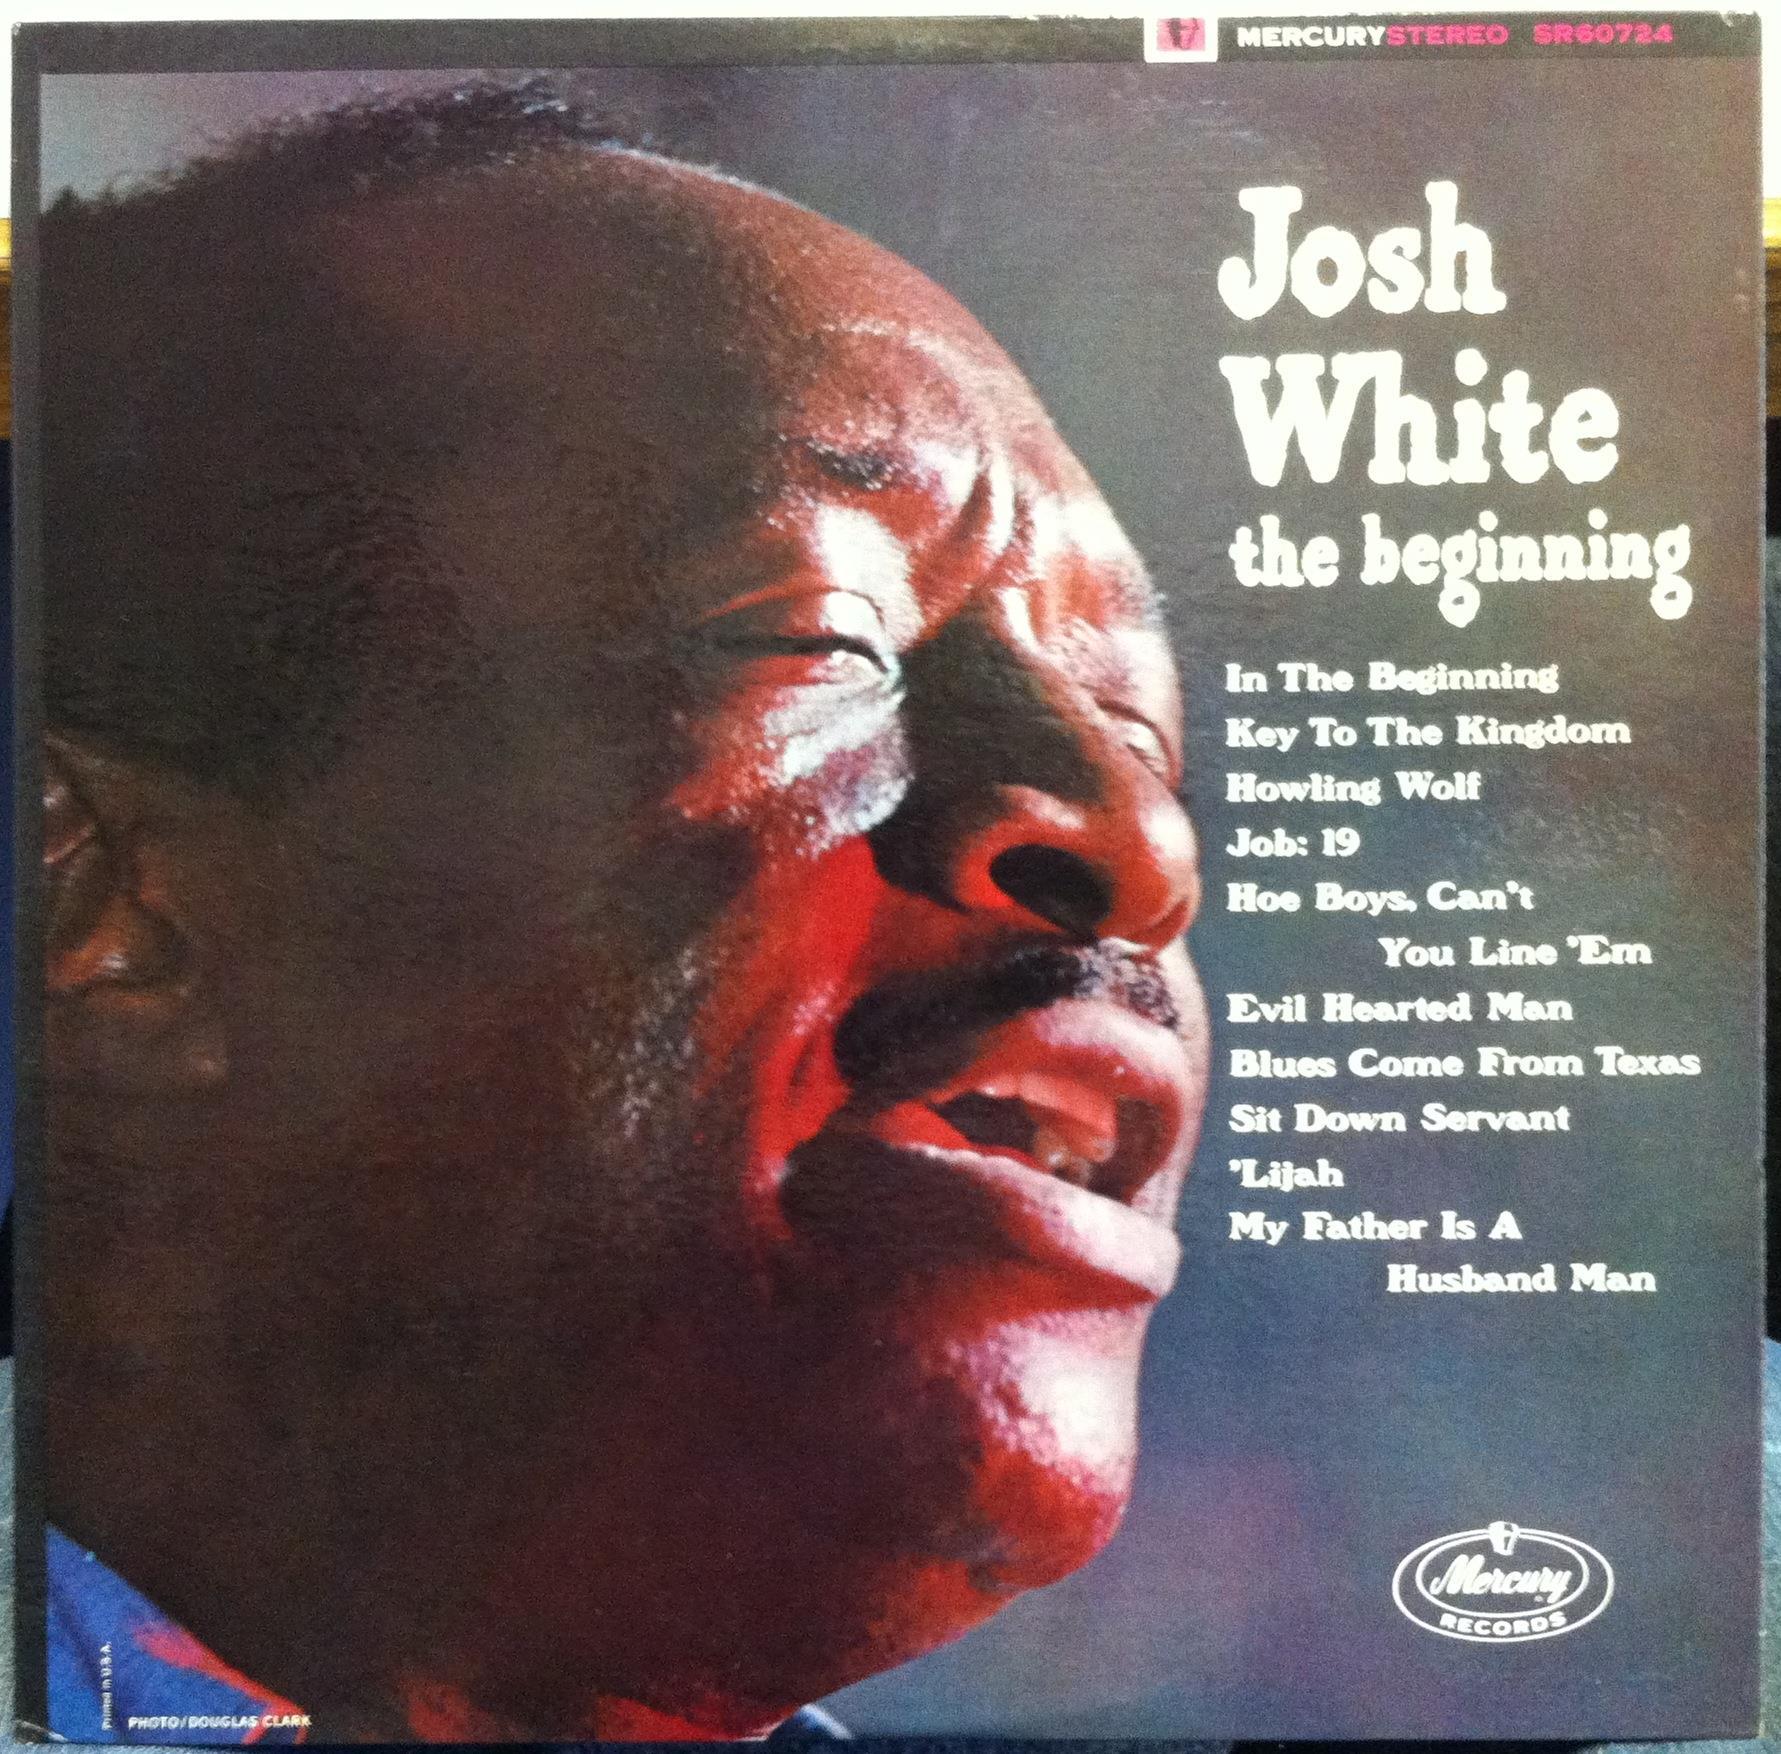 JOSH WHITE - Josh White The Beginning Lp Vg+ Sr-60724 Vinyl 1963 Blues Stereo 1st Record (the Beginning)